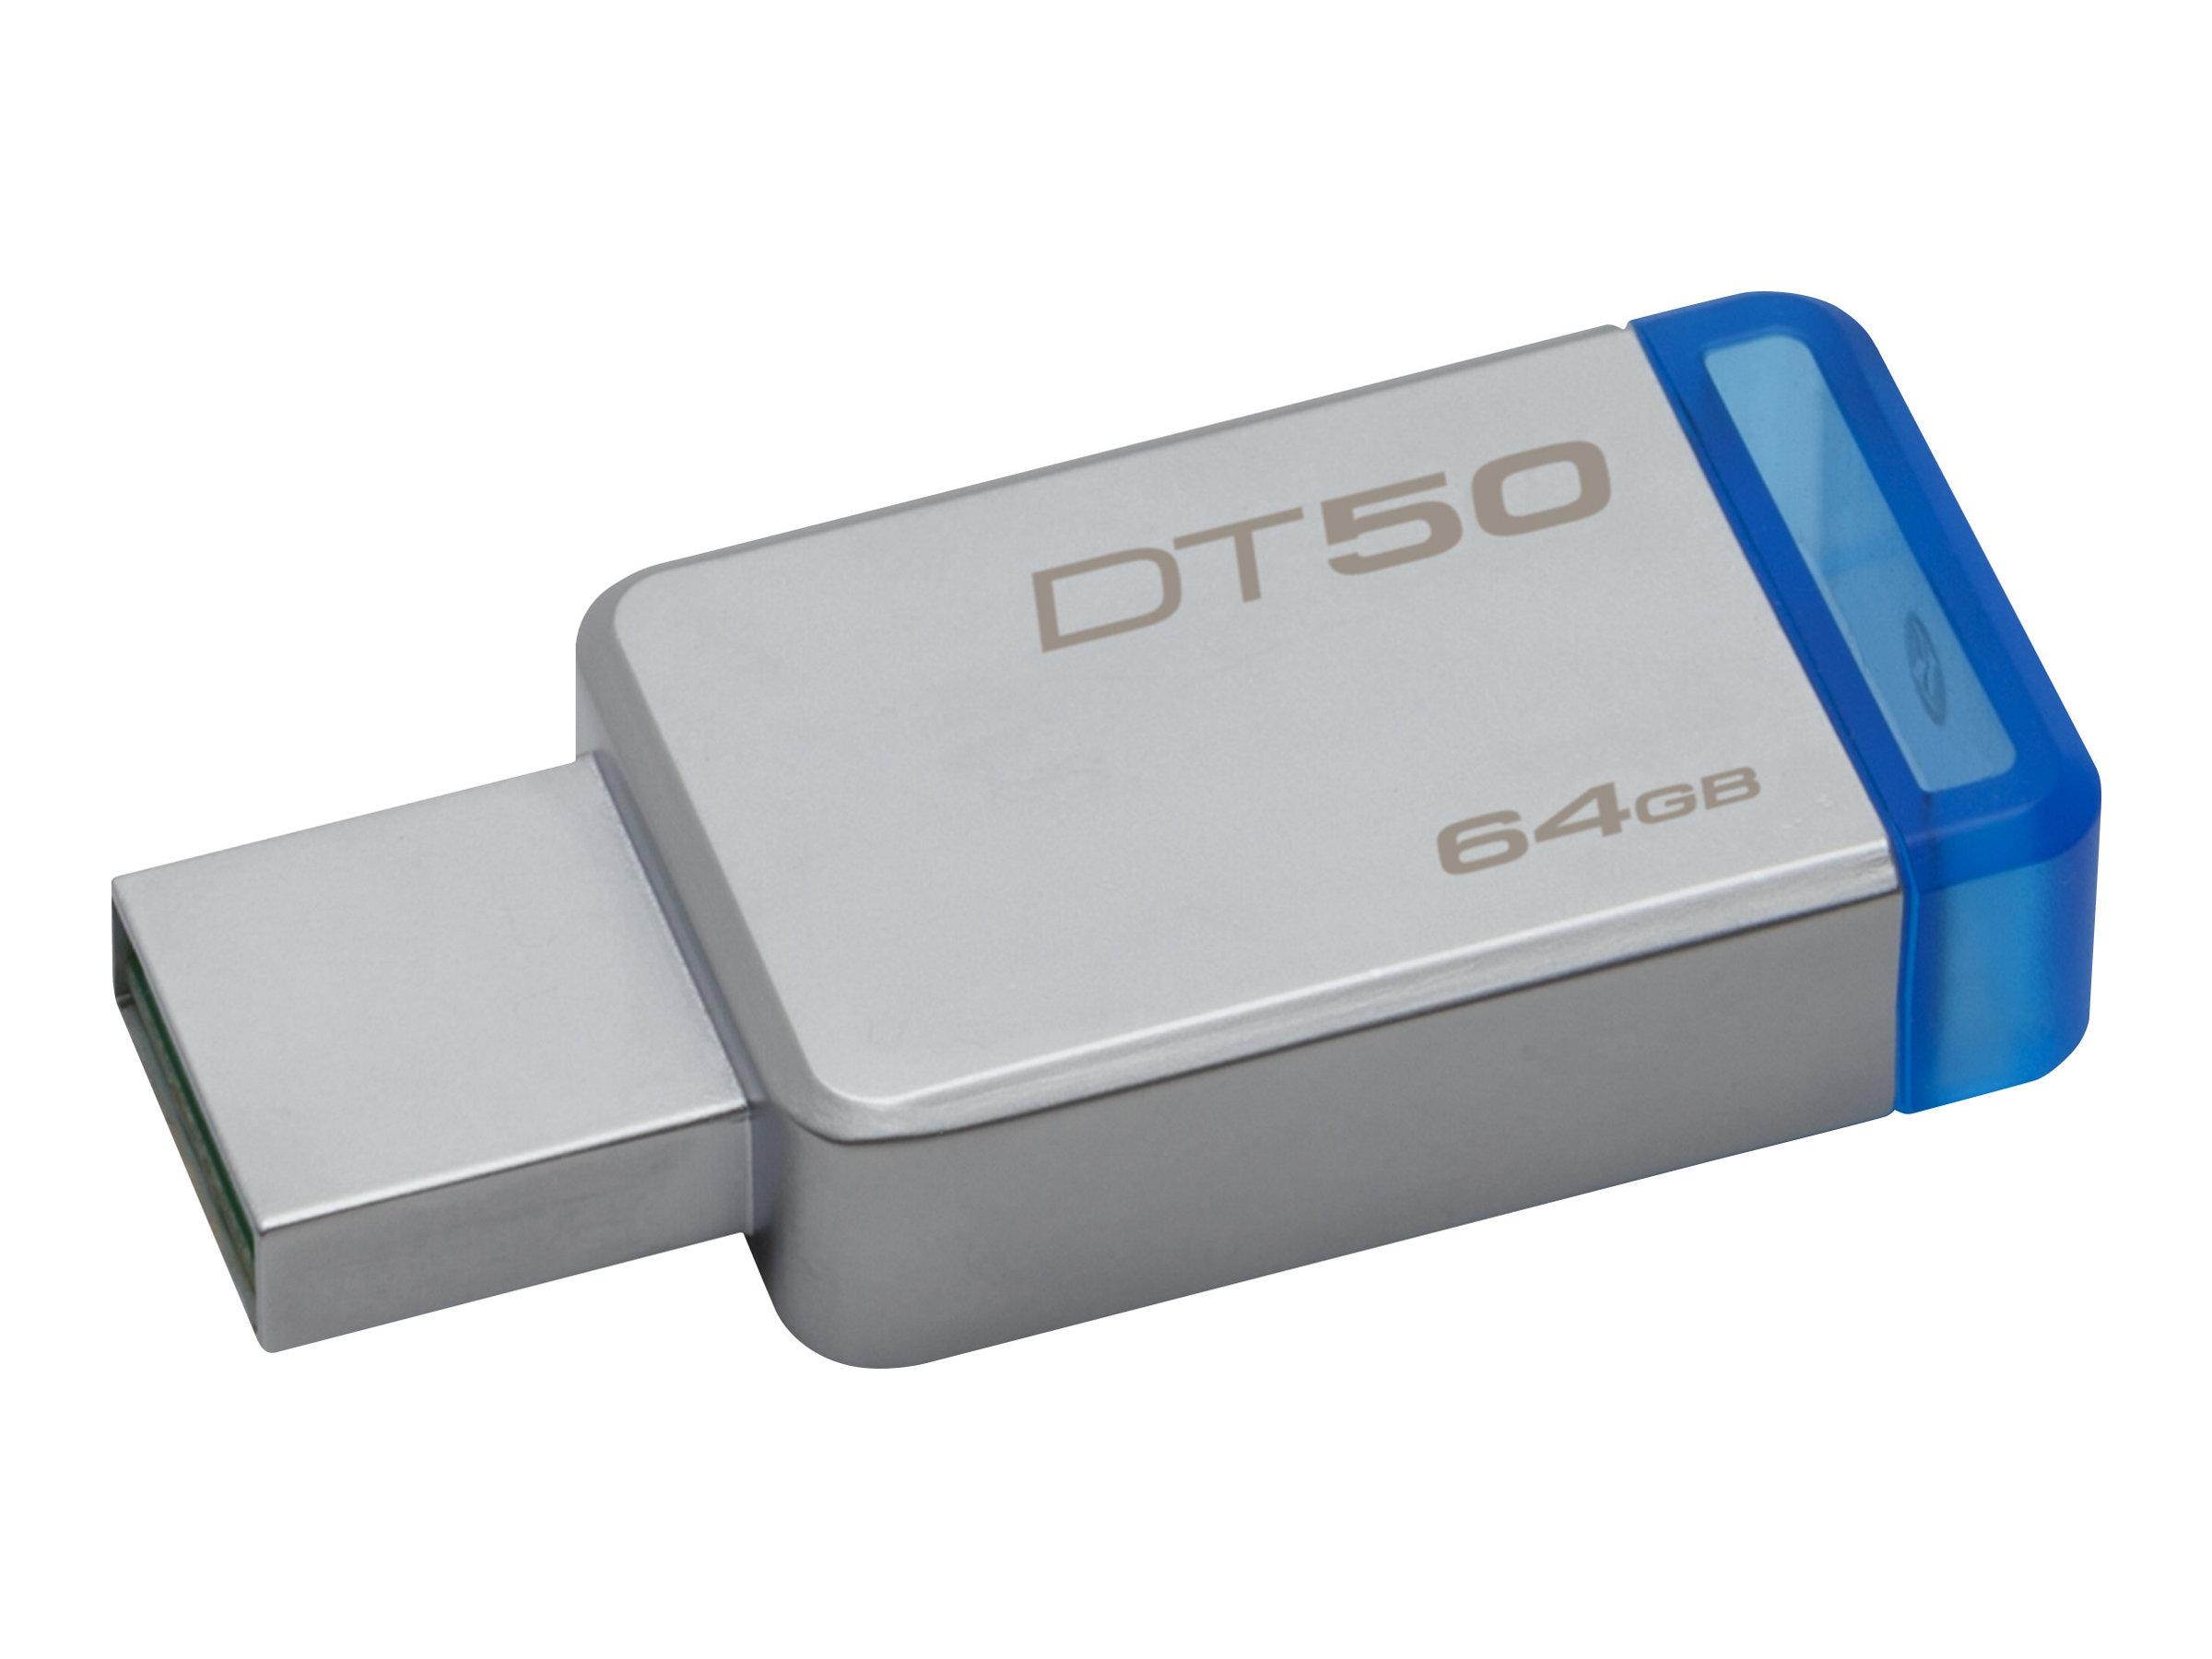 Kingston DataTraveler 50 - USB-Flash-Laufwerk - 64 GB - USB 3.1 - Blau